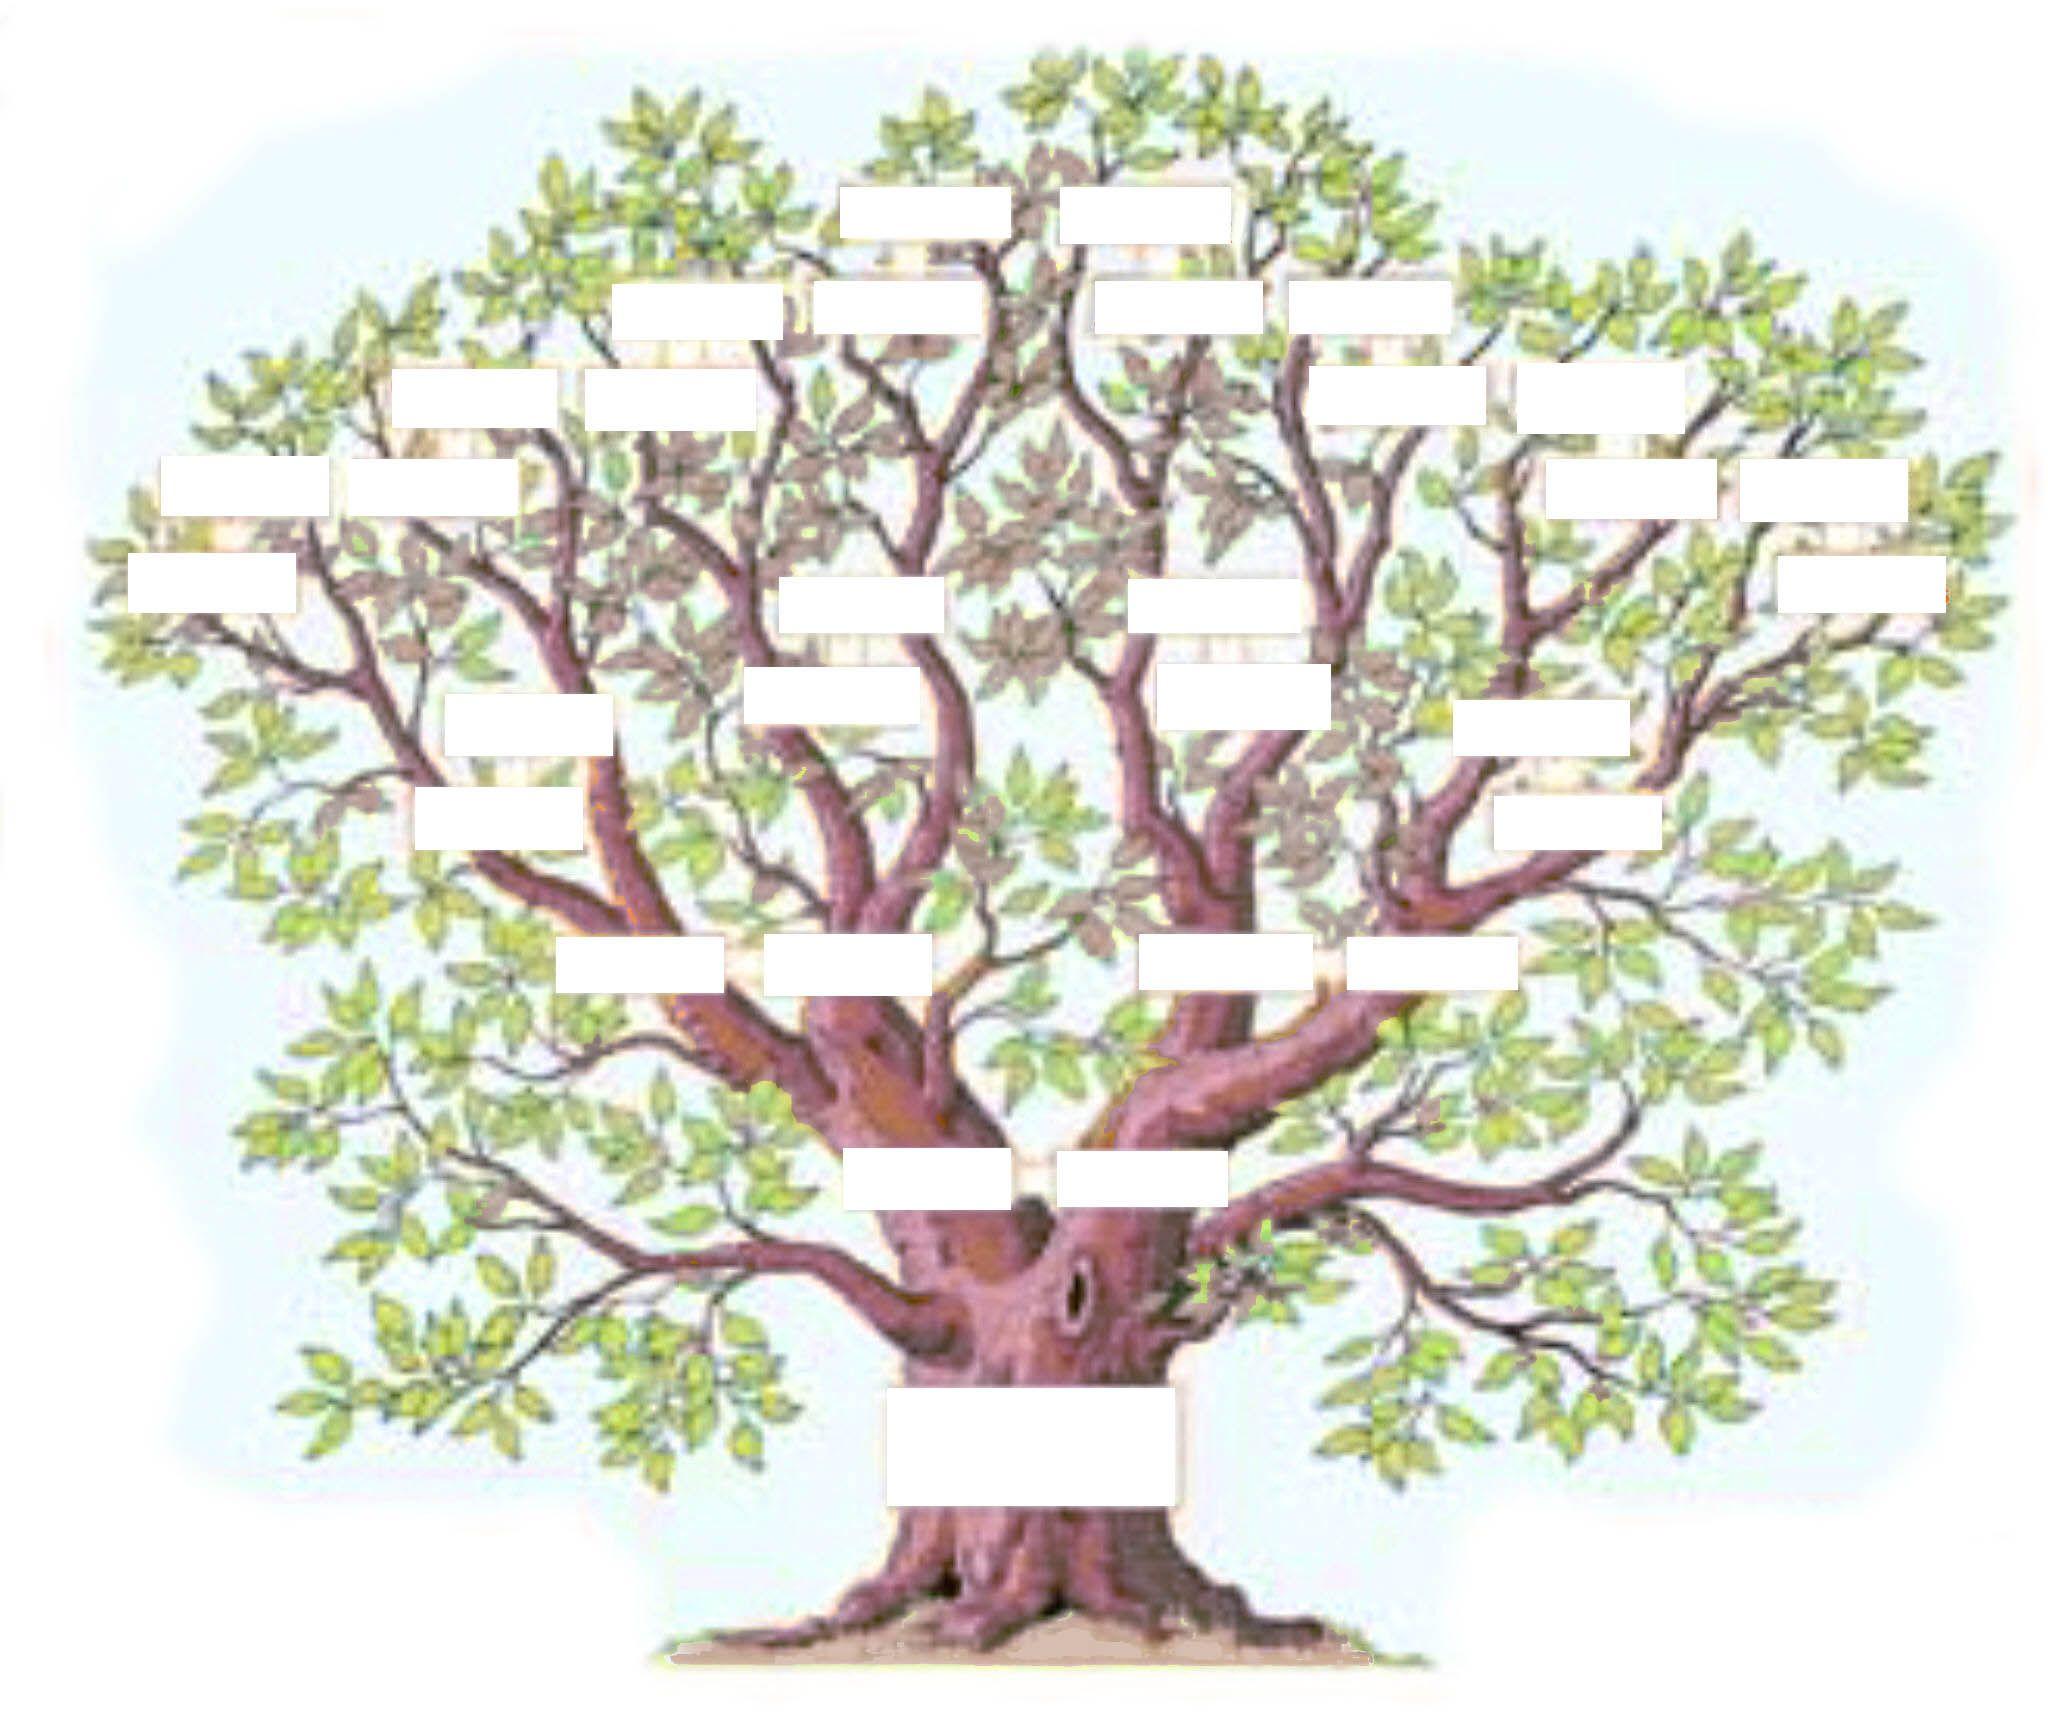 L Arbre Genealogique Exercice Art D Arbre Genealogique Arbre